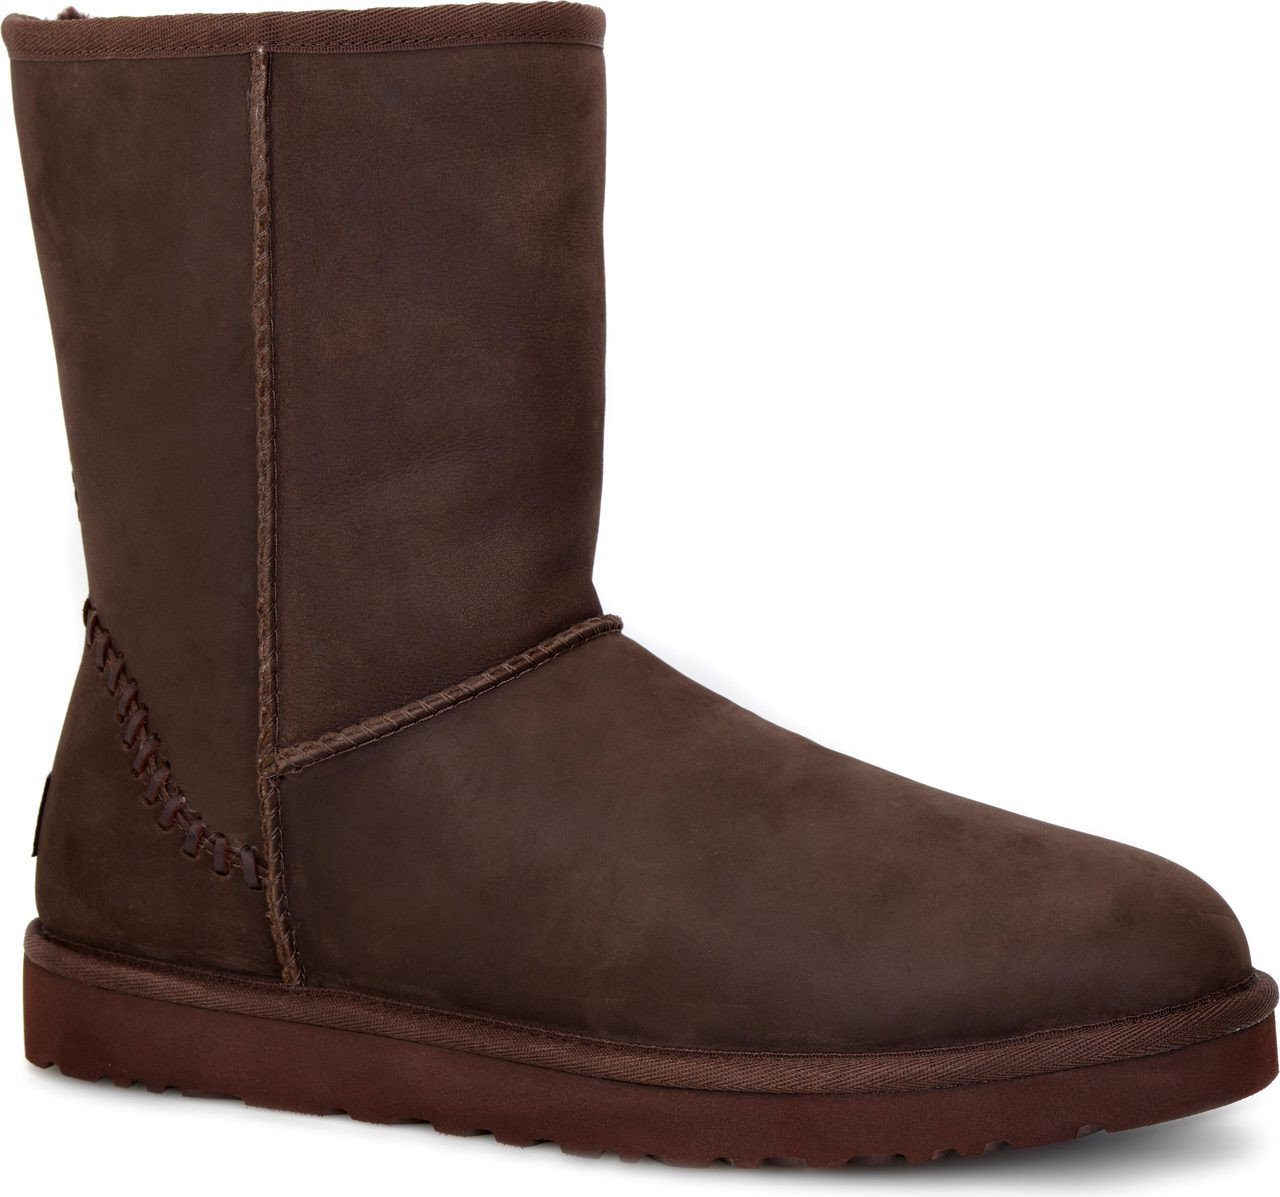 ugg boots australia buy online